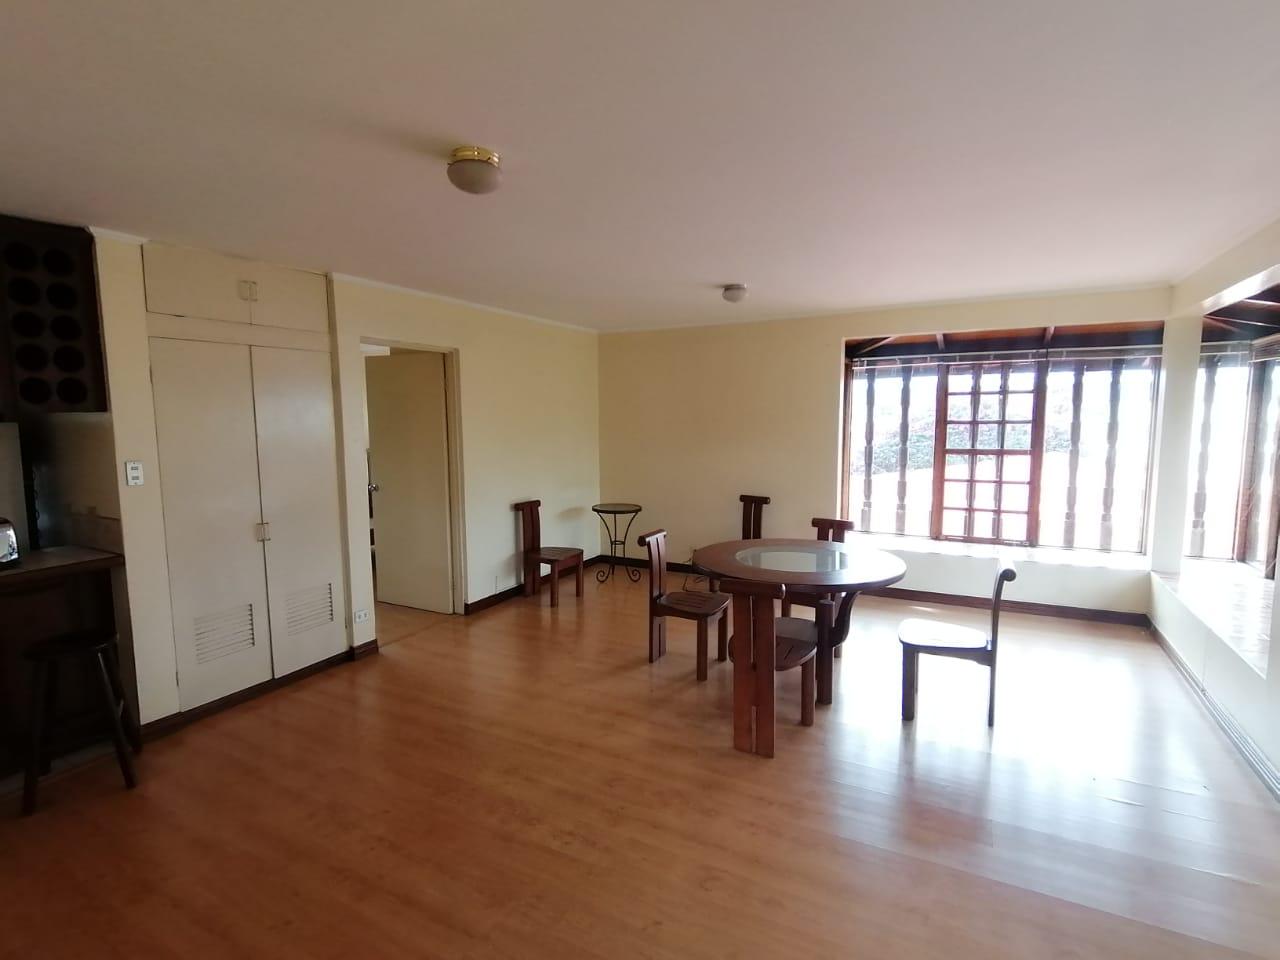 2655 Se Alquila apartamento en Freses, Curridabat